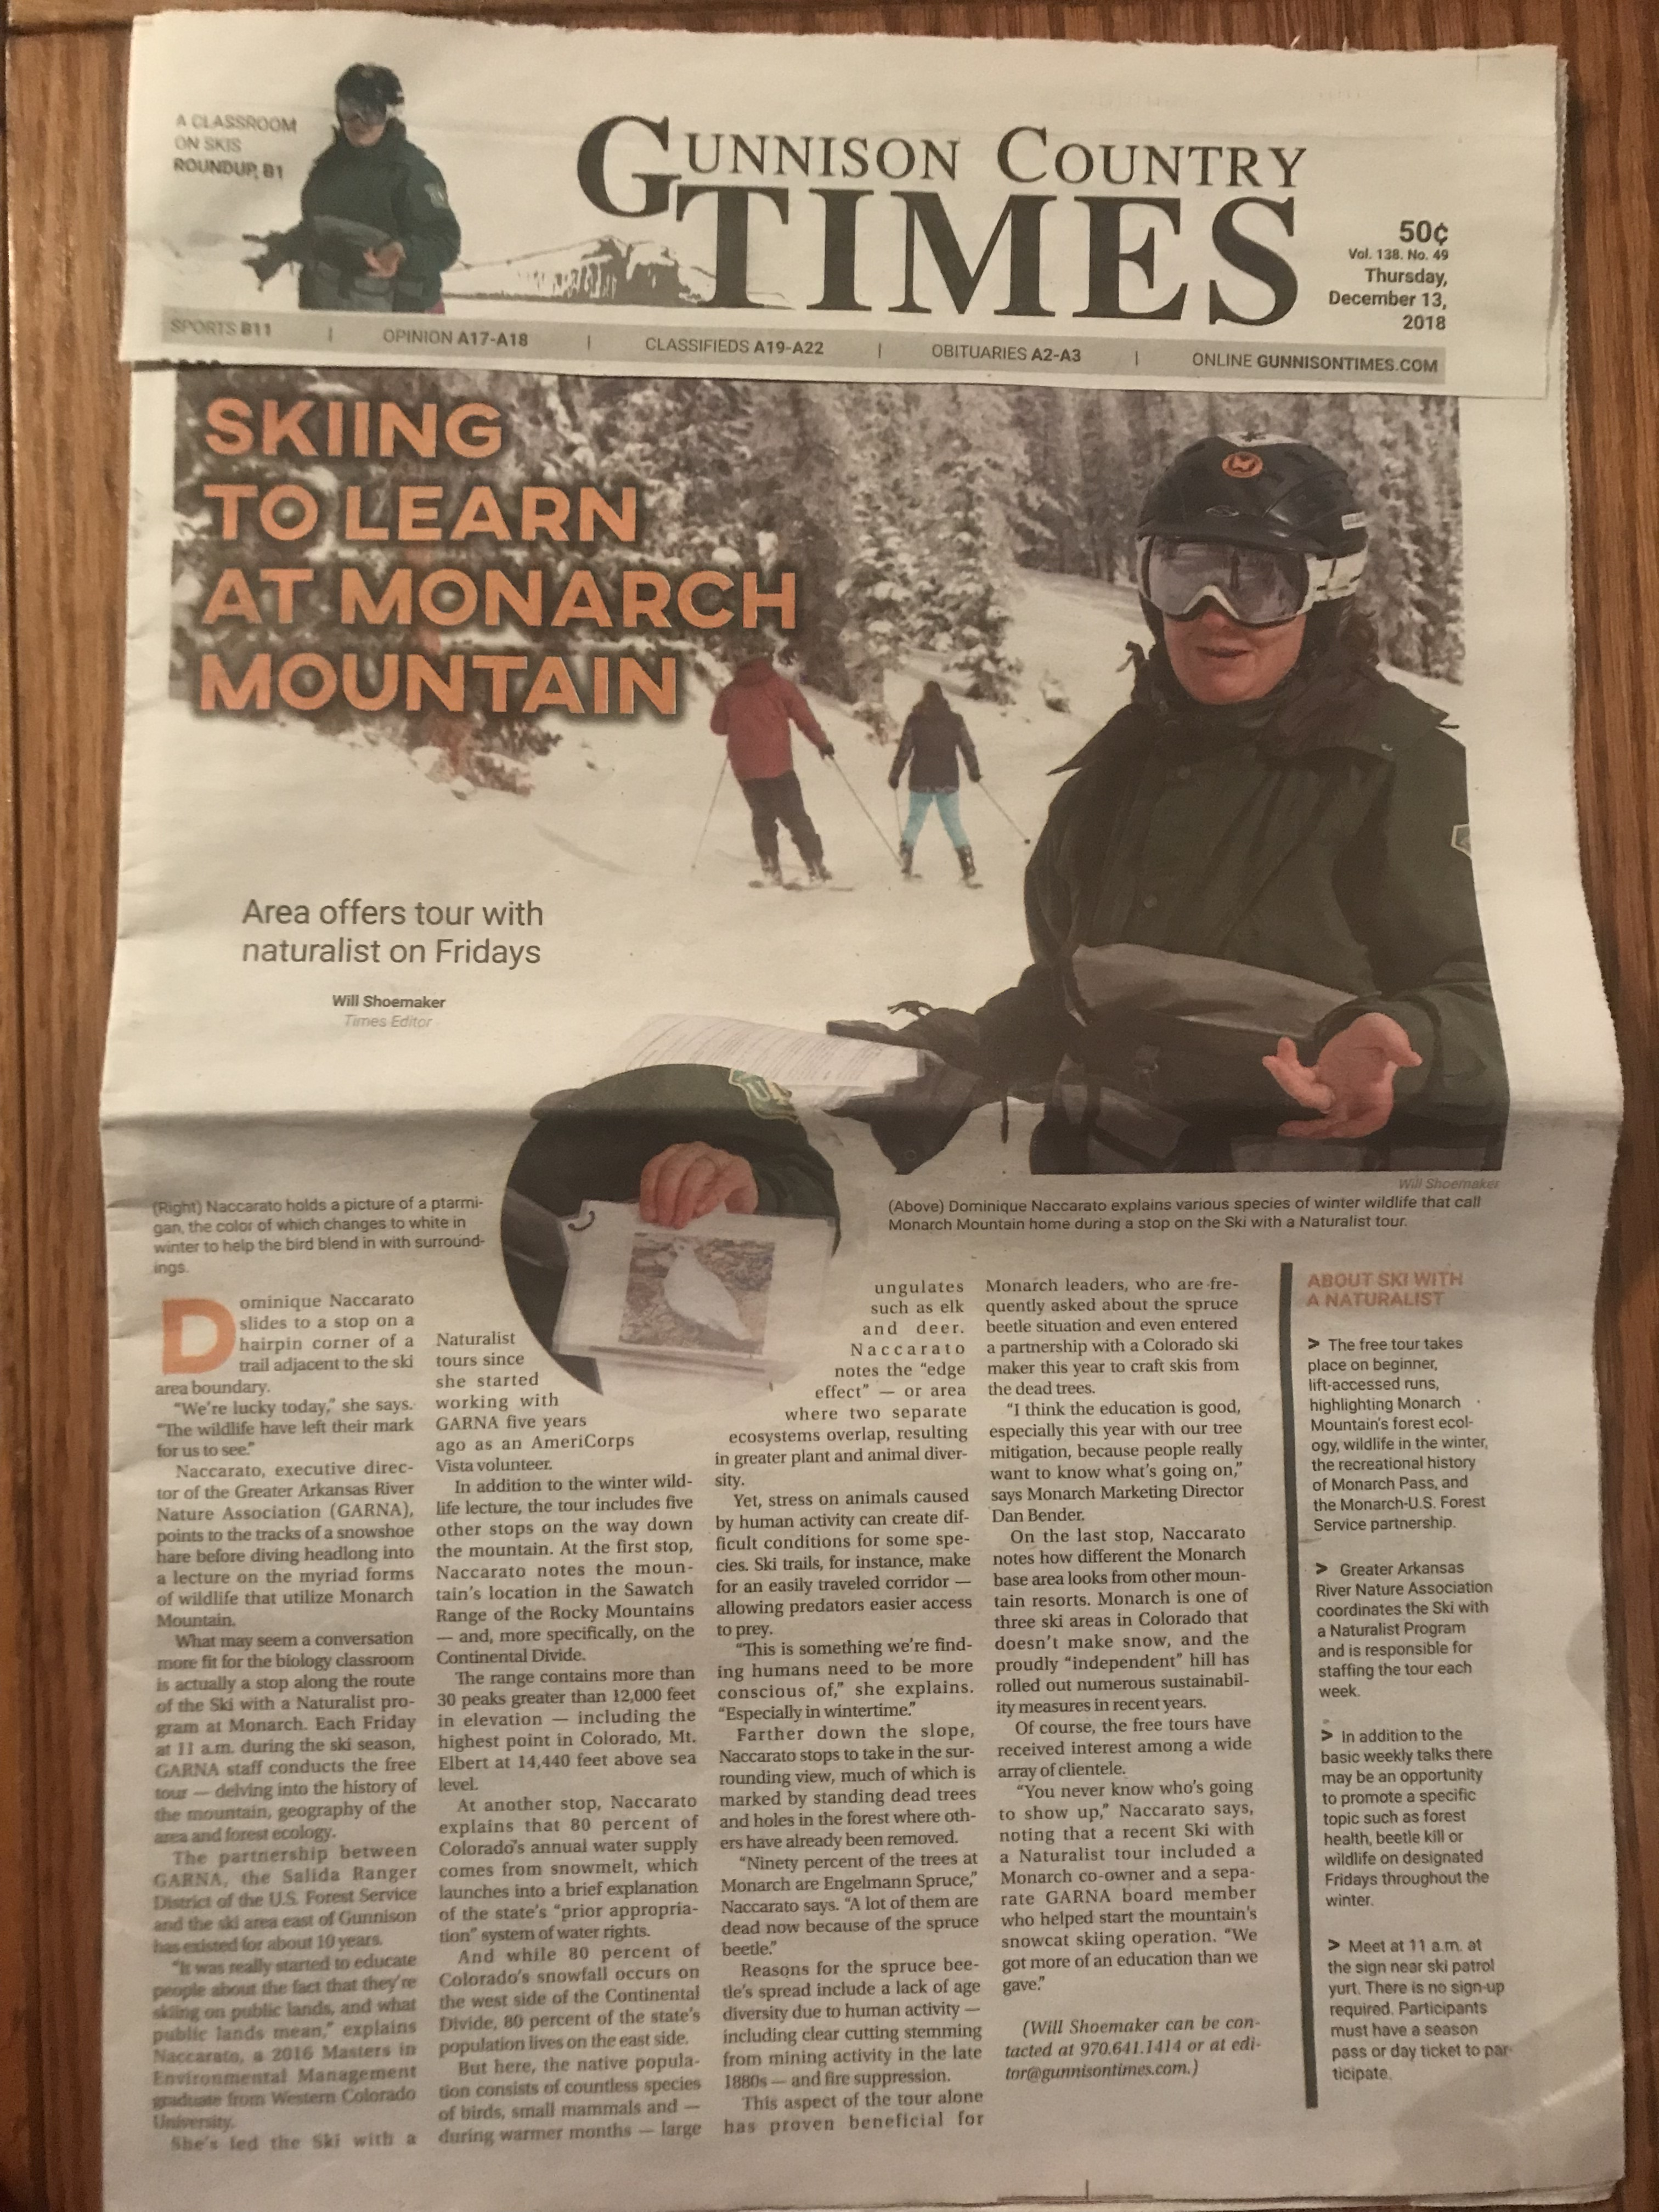 GARNA Director featured in Gunnison Country Times